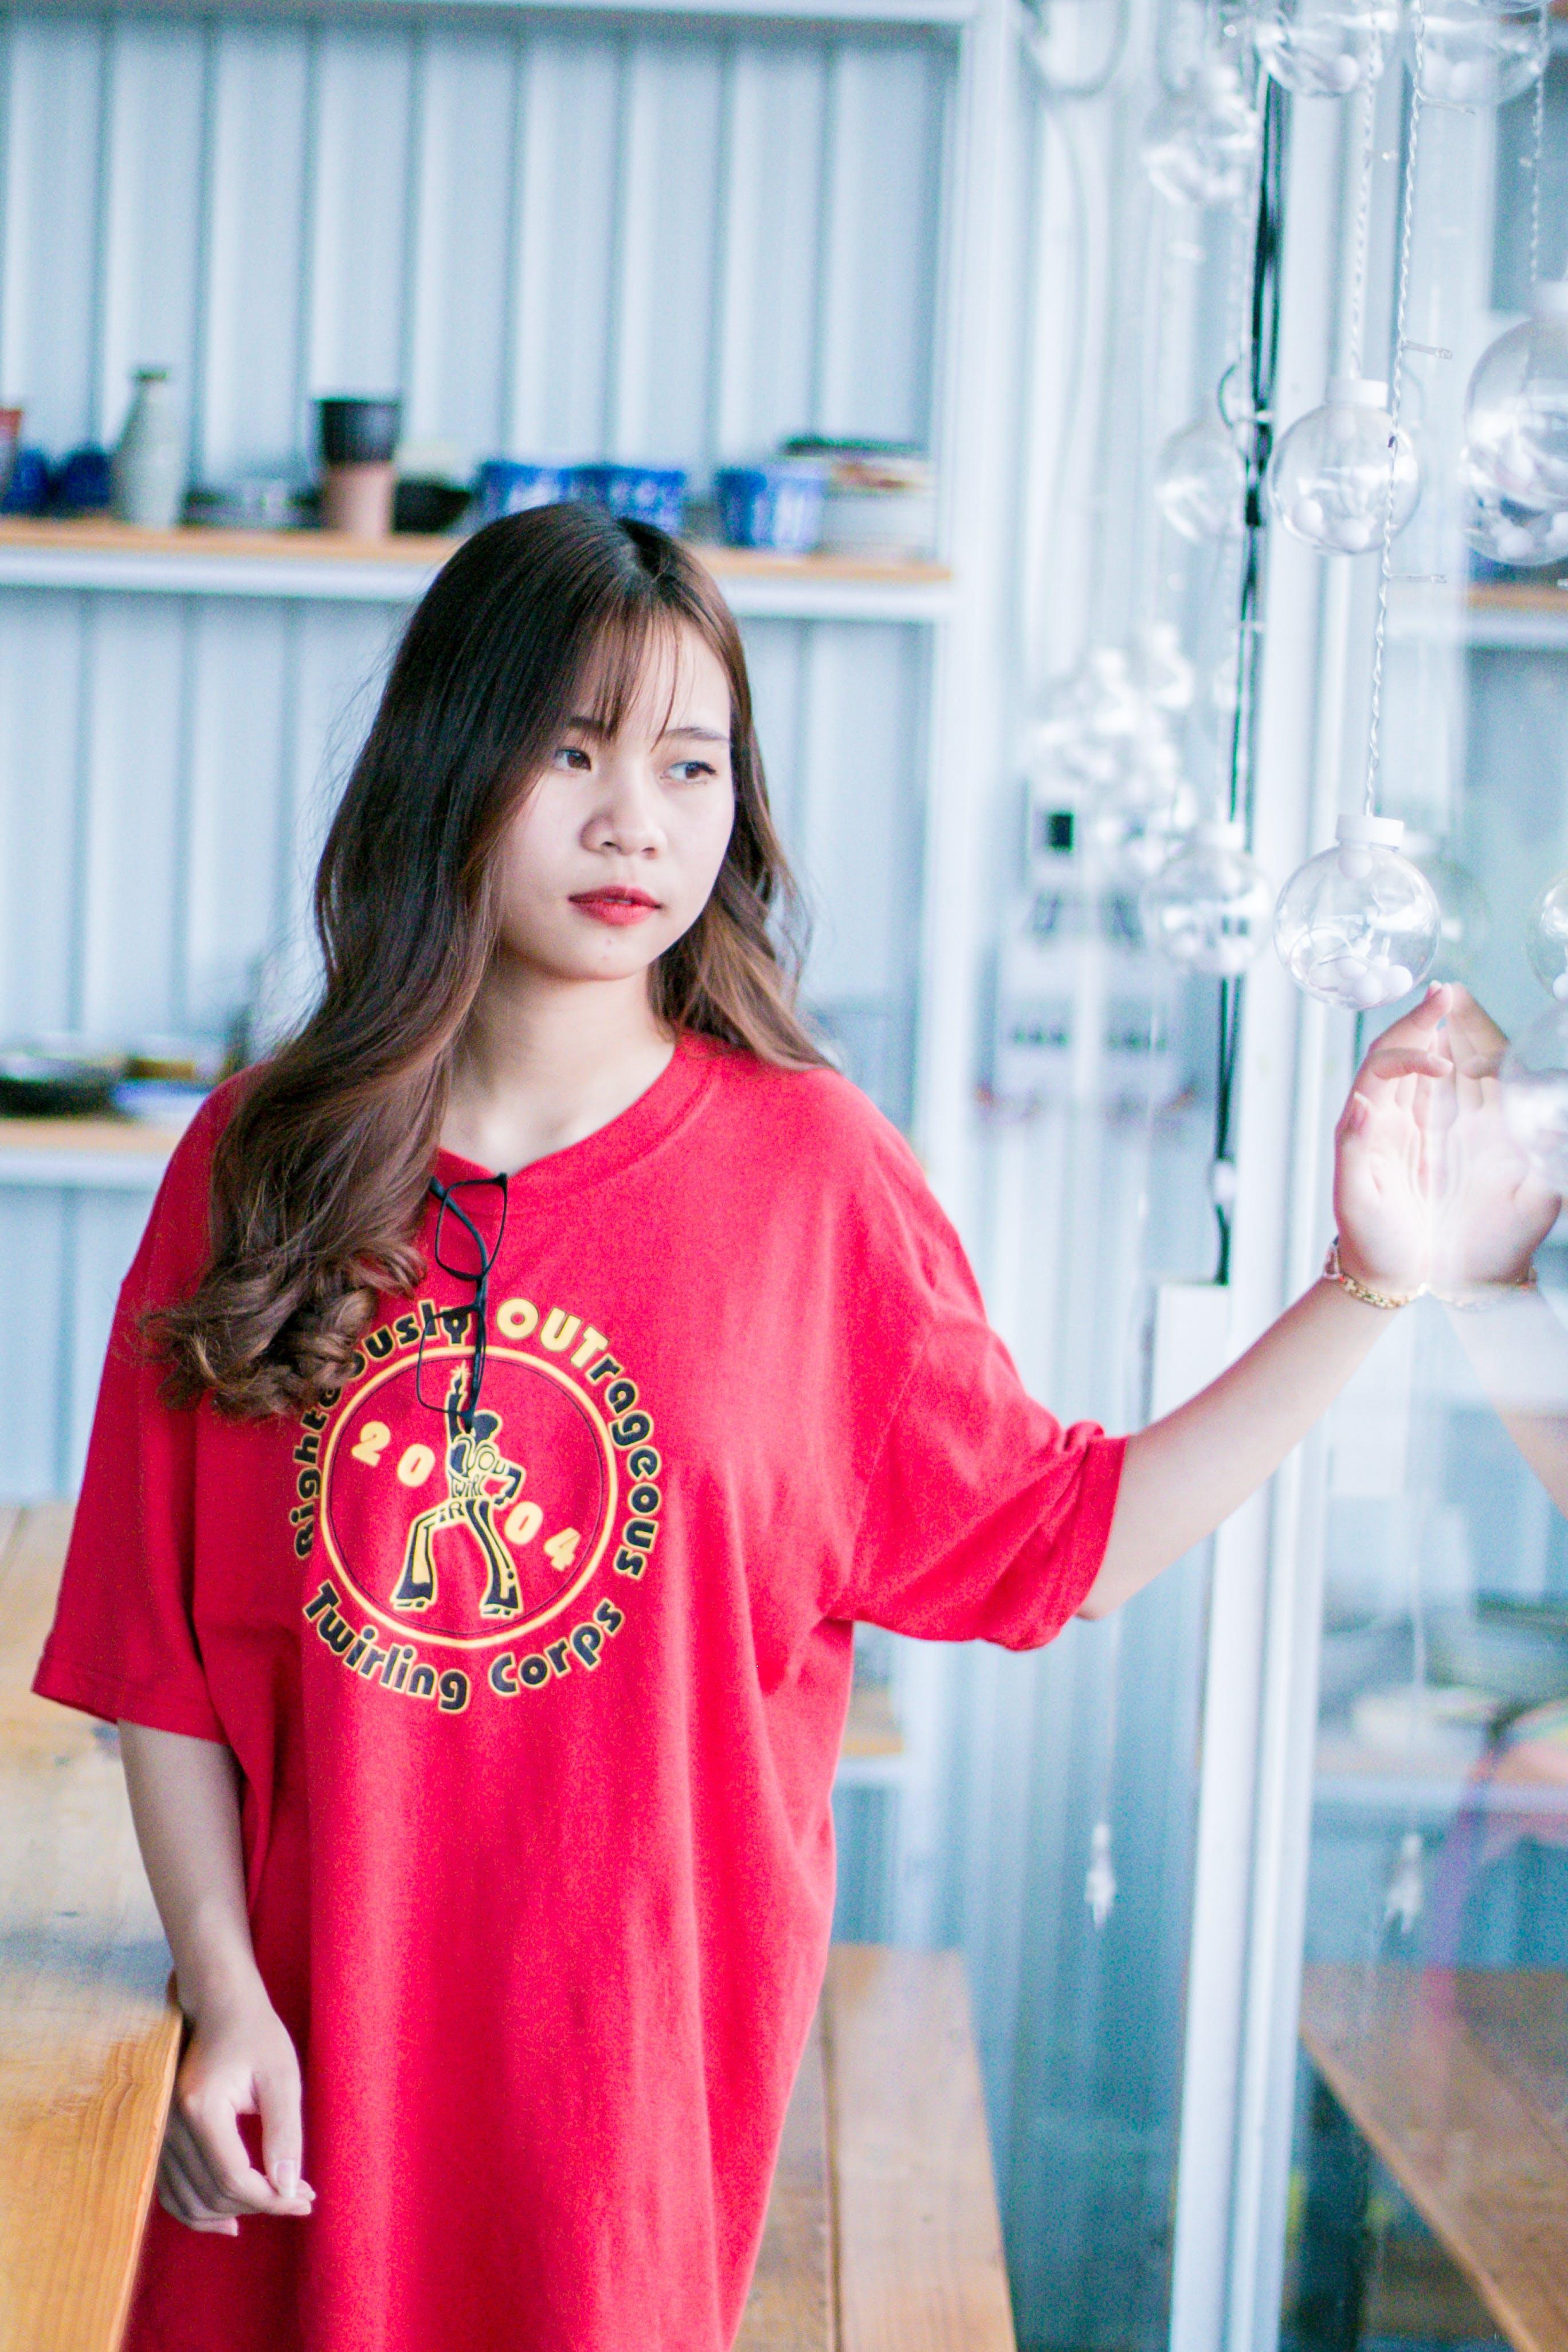 Woman Wearing Red Shirt Standing Near Glass Hanging Decor